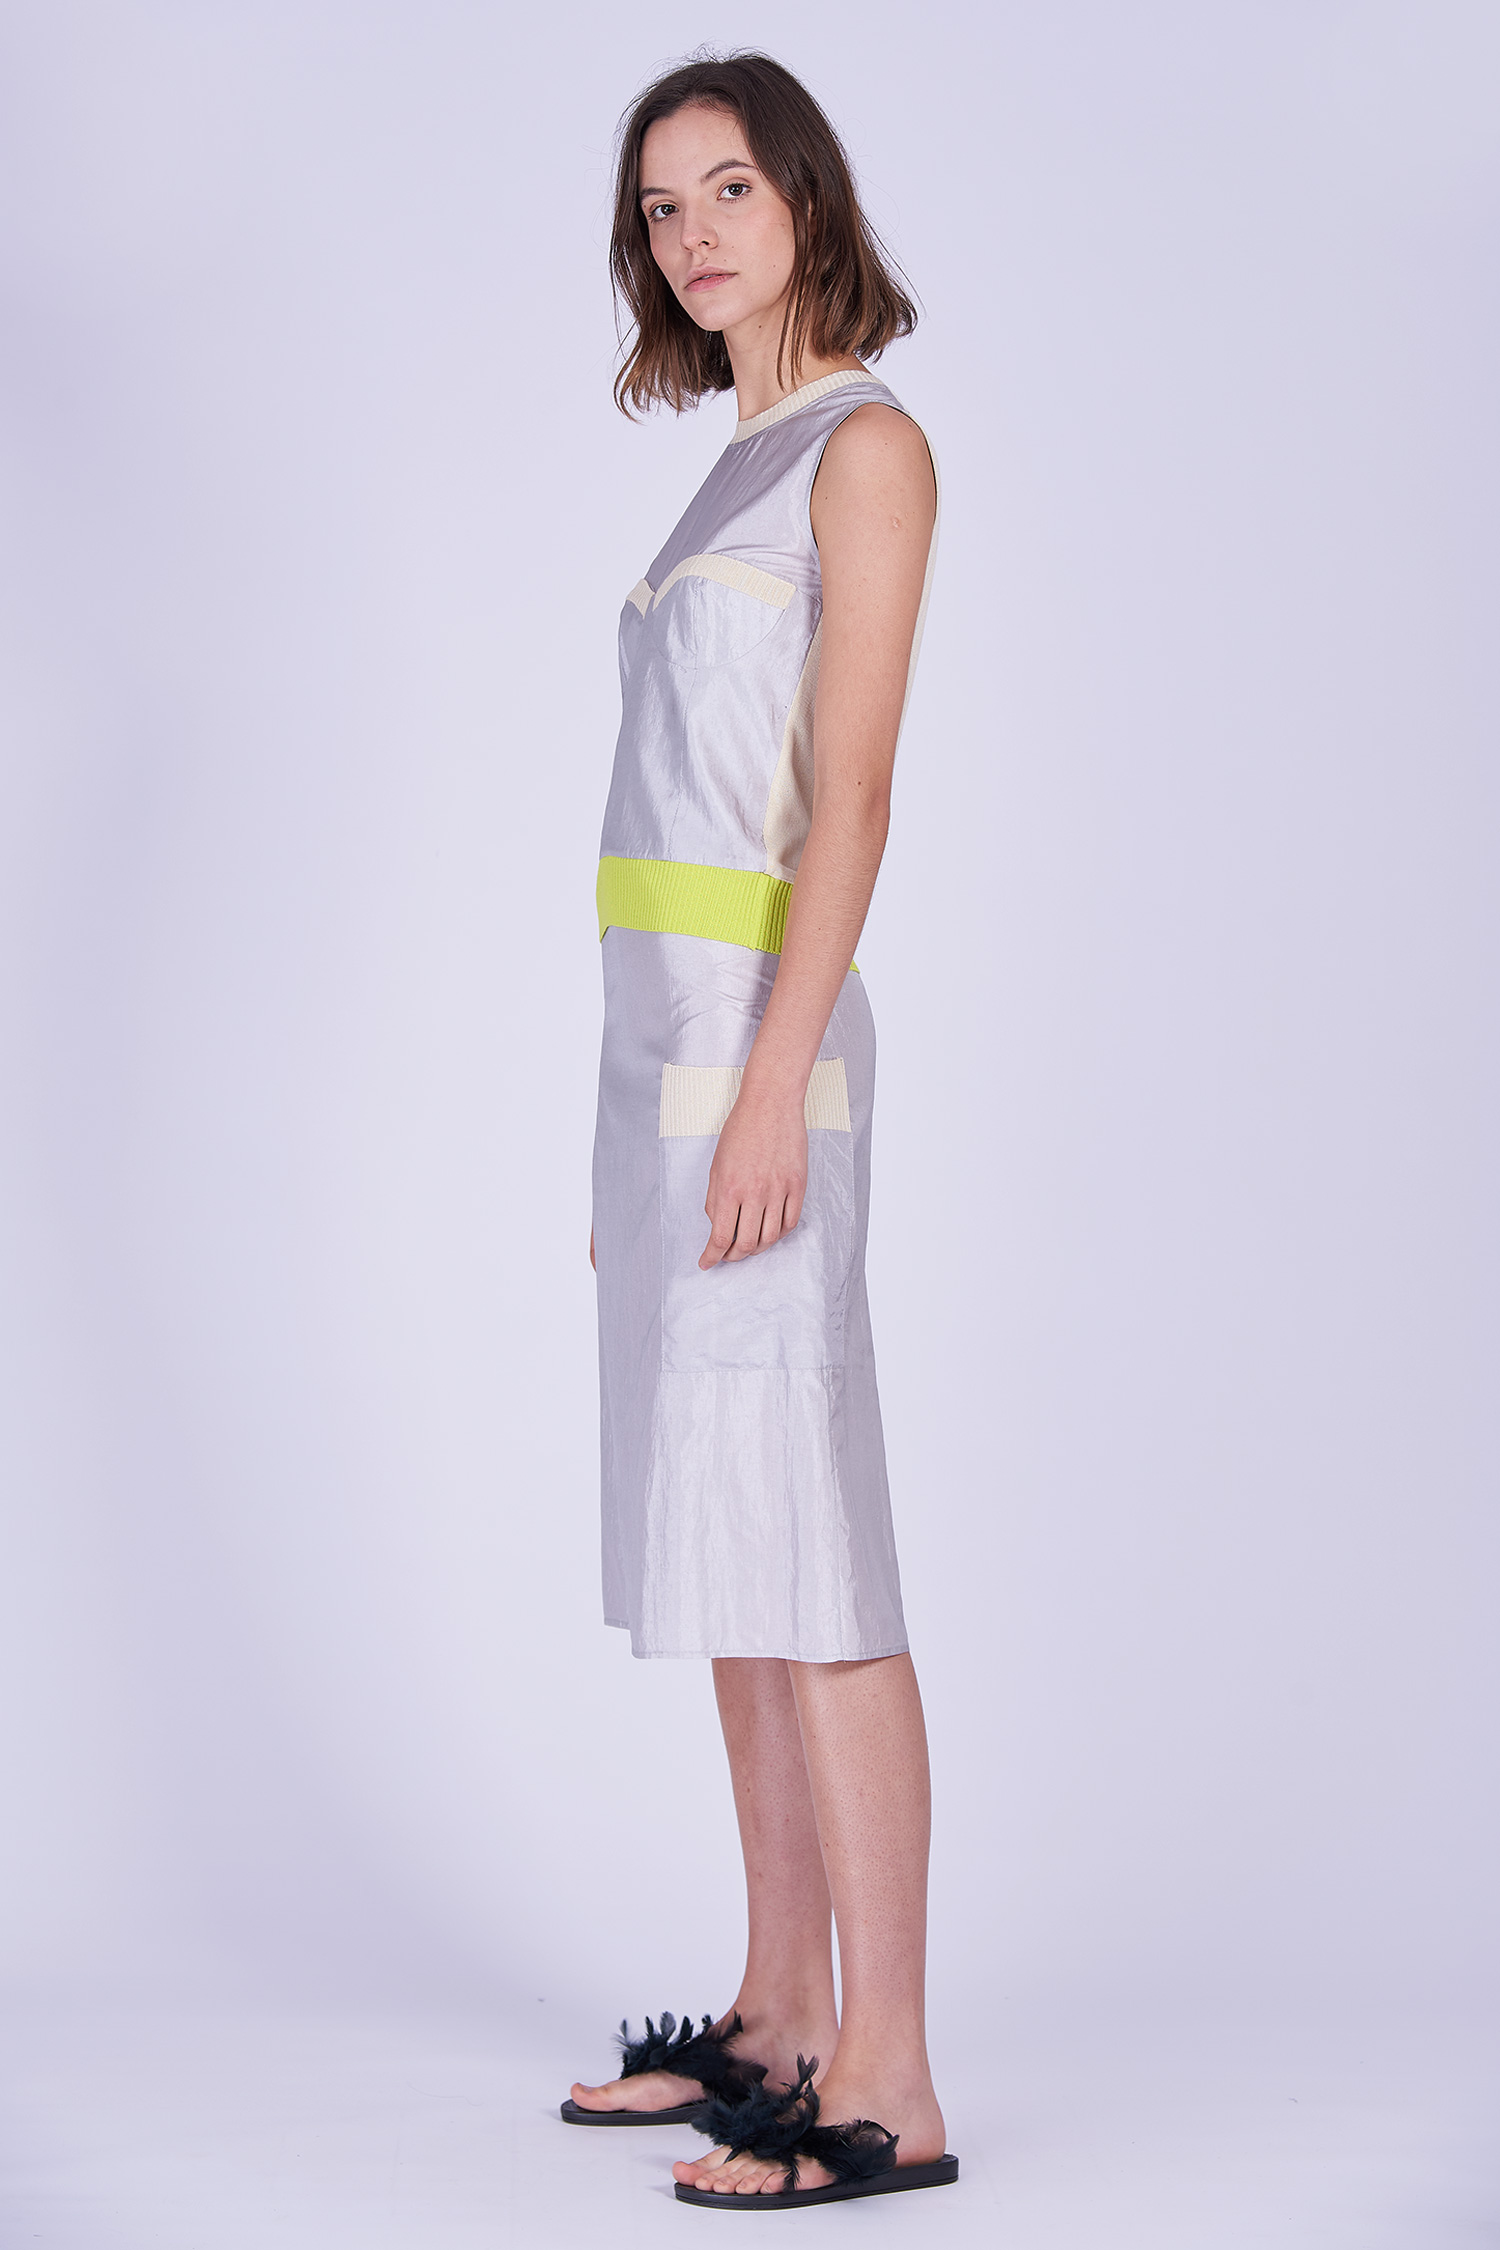 Acephala Ss2020 Silver Bustier Top Midi Skirt Srebrny Gorsetowy Srebrna Spodnica Side